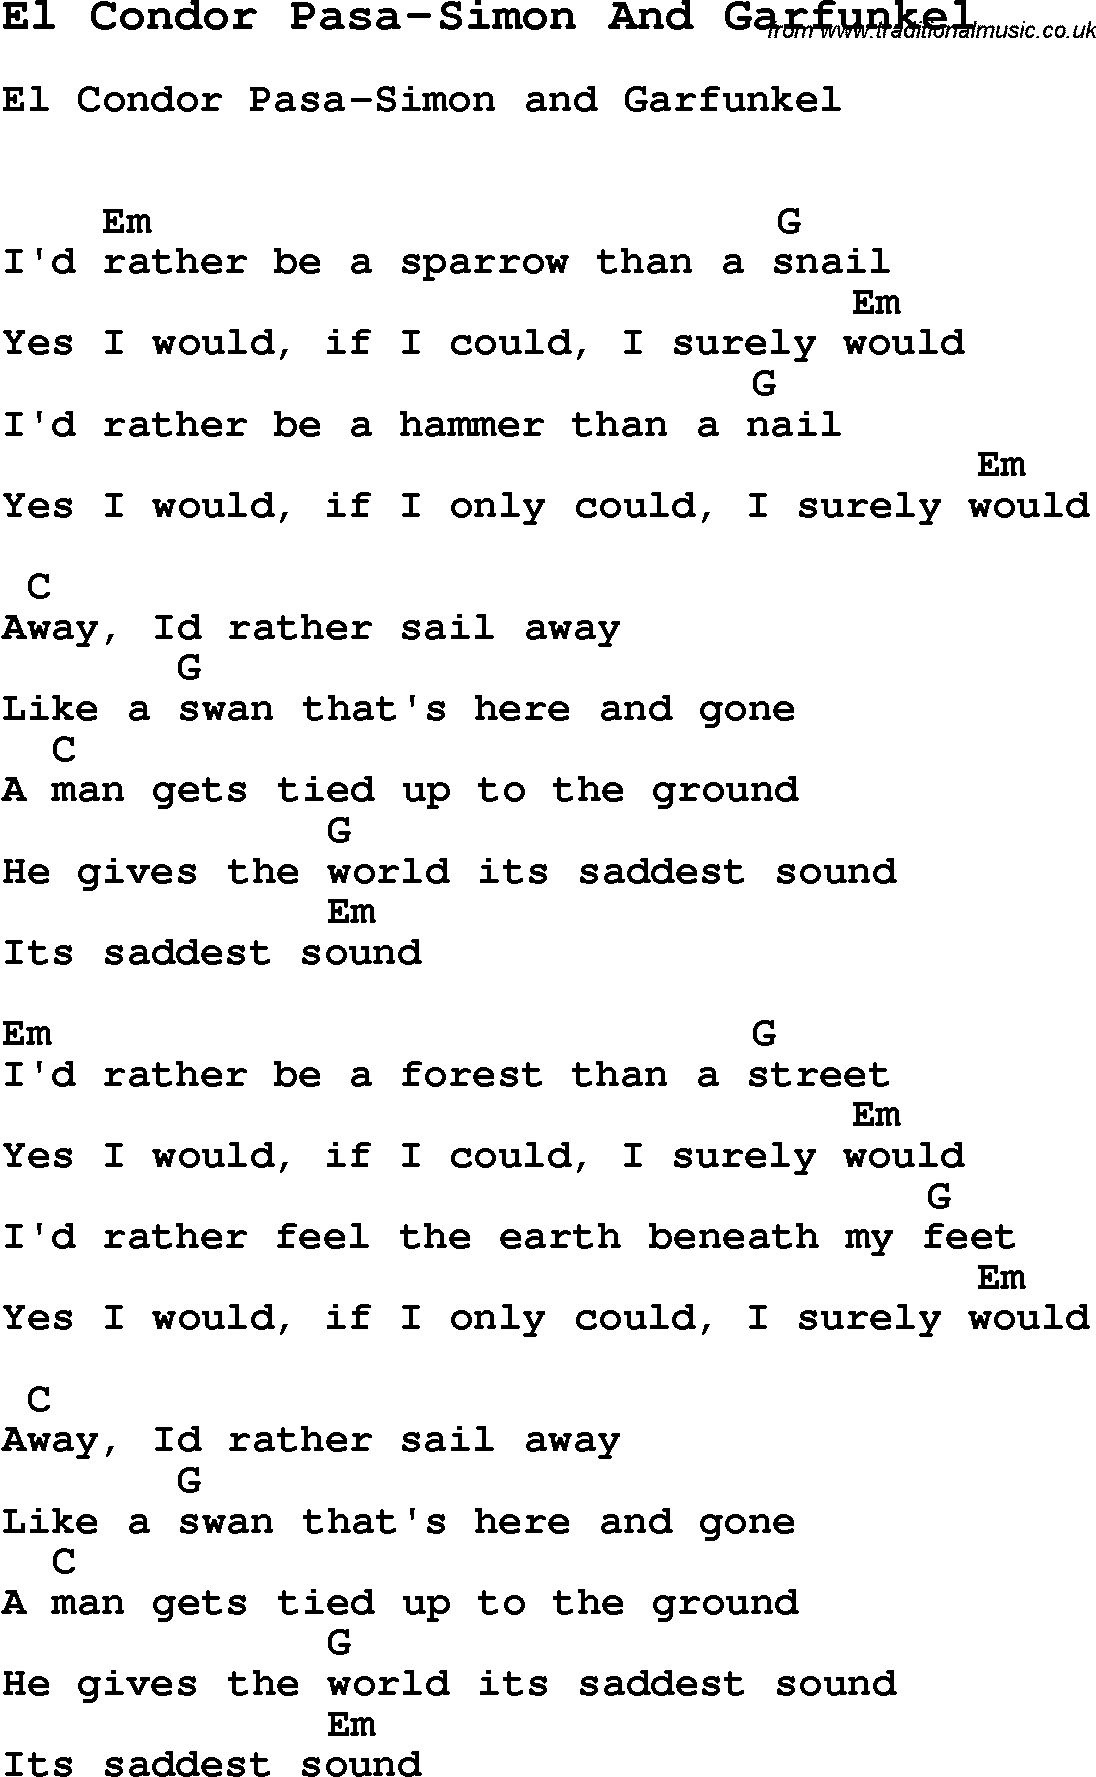 Summer Camp Song El Condor Pasa Simon And Garfunkel With Lyrics